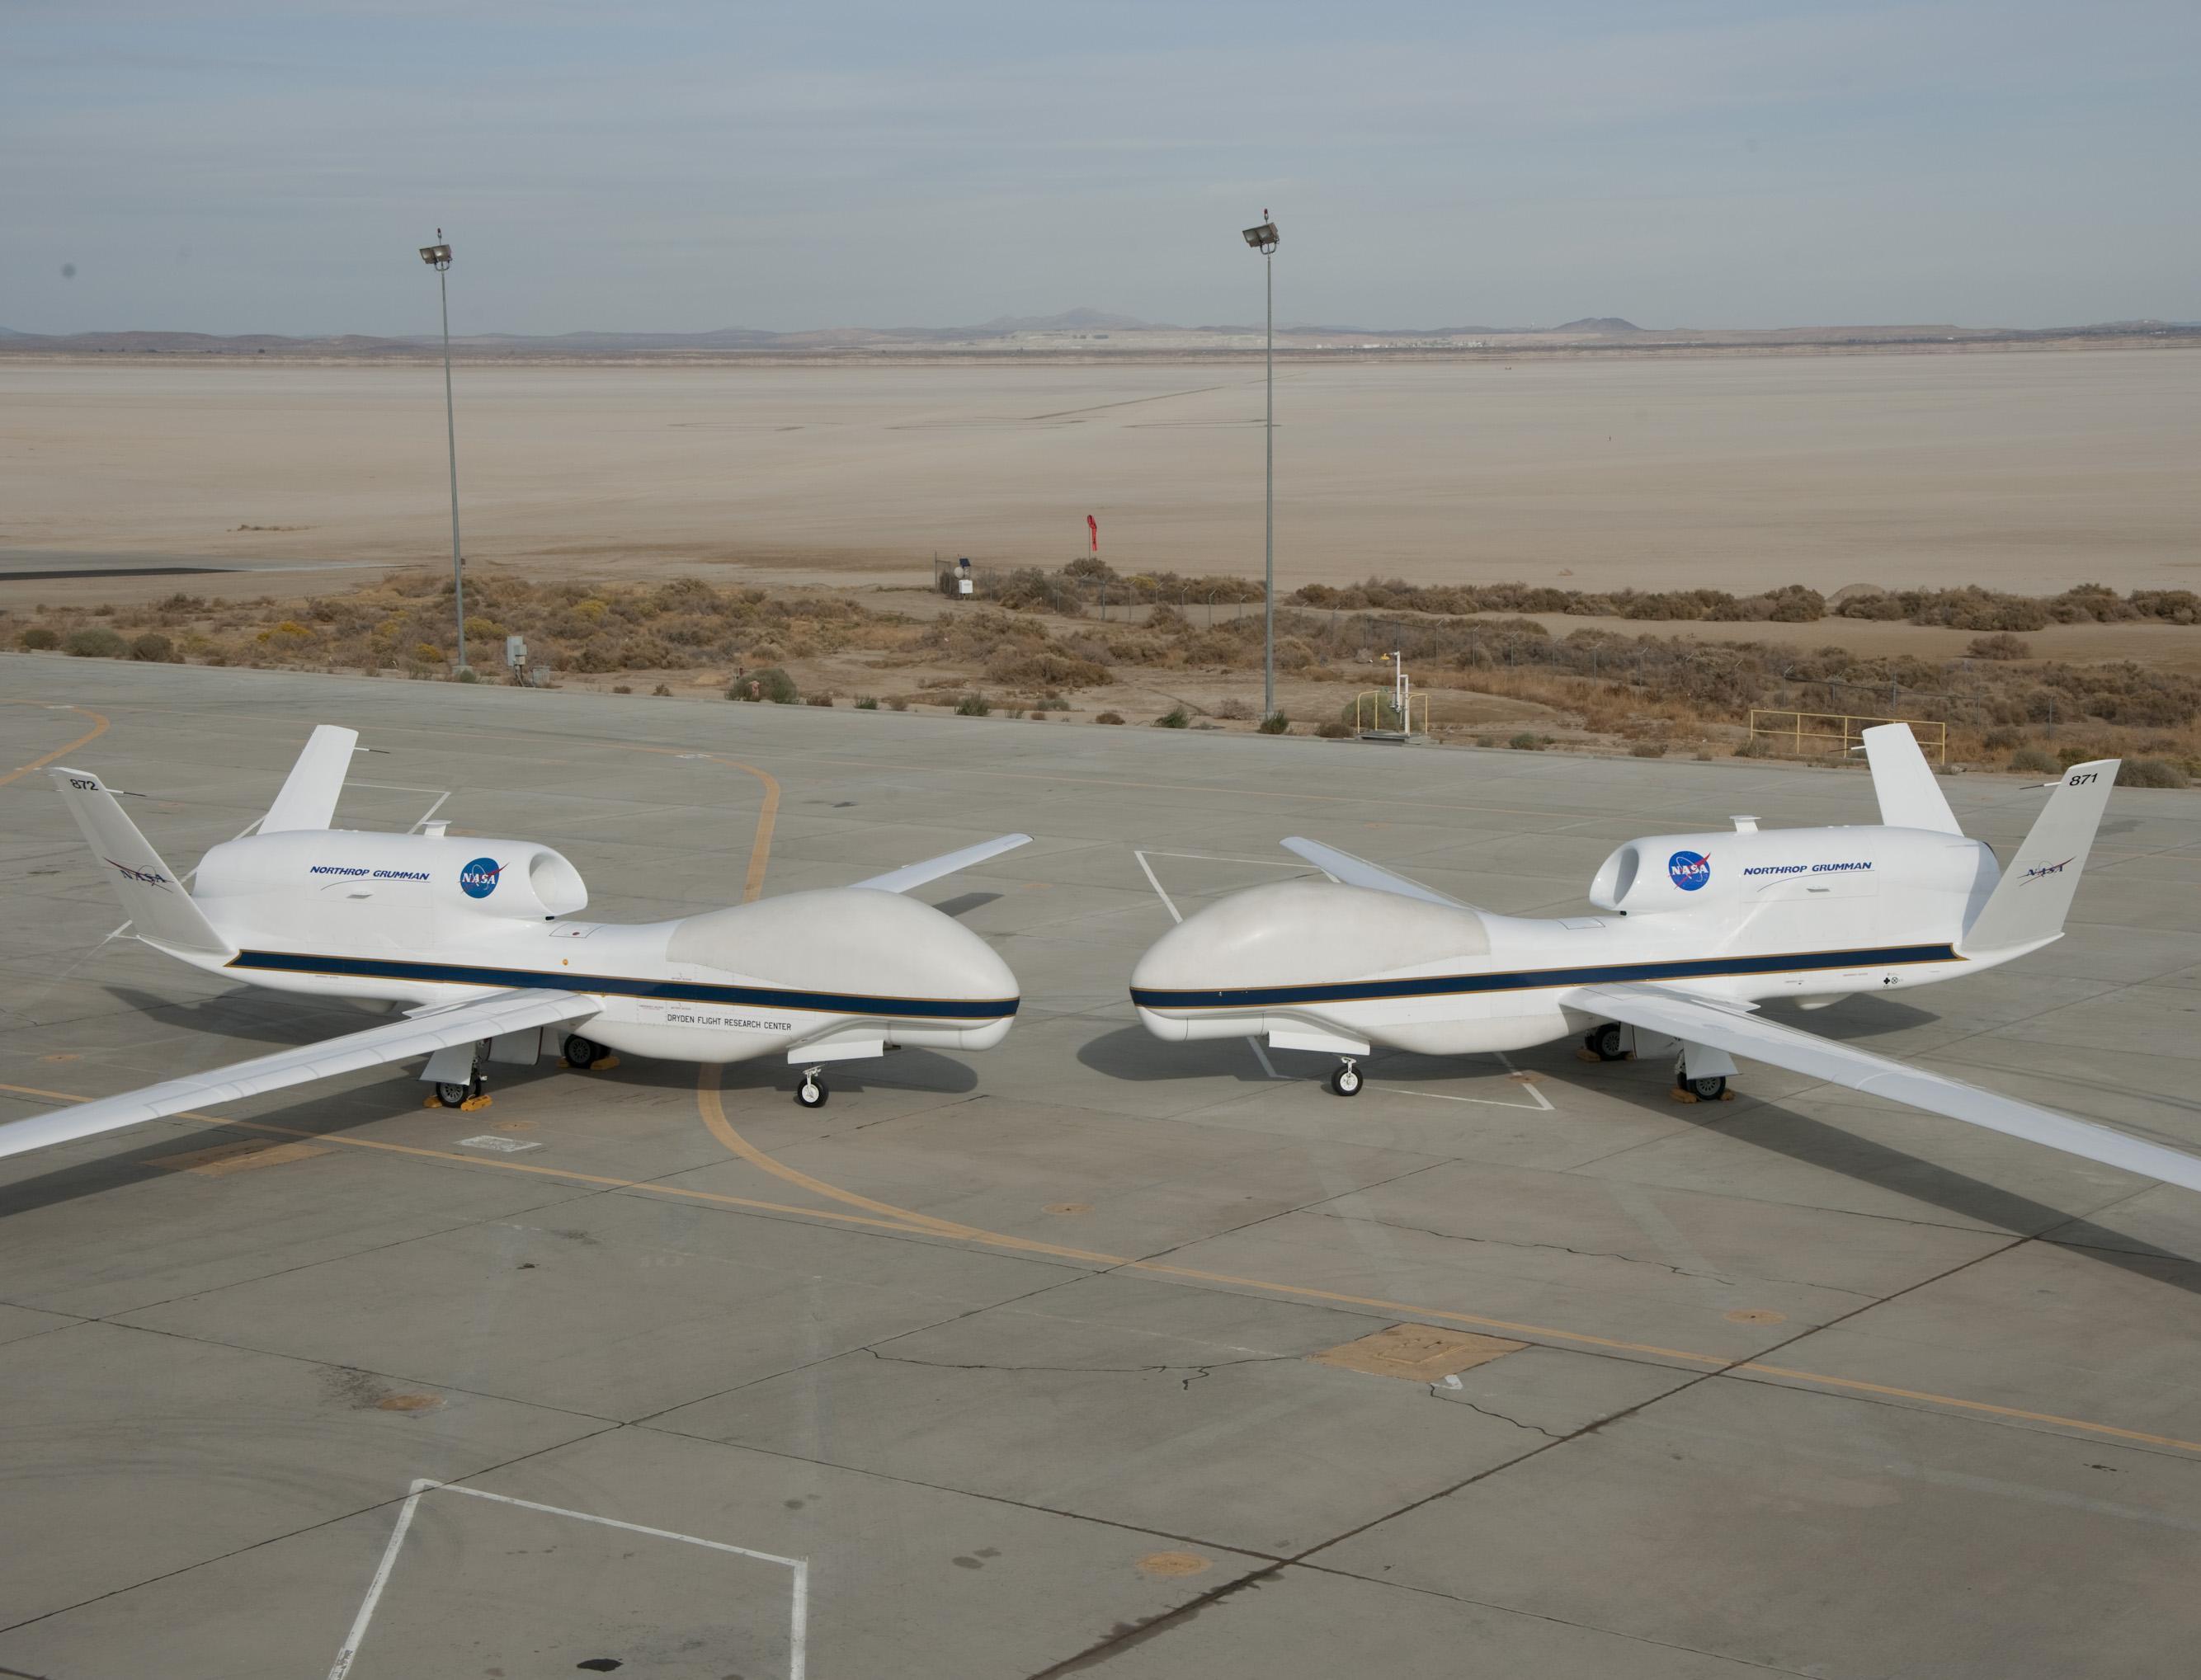 Nasa nasa global hawks prepare for 2012 hurricane study for Nasa air study